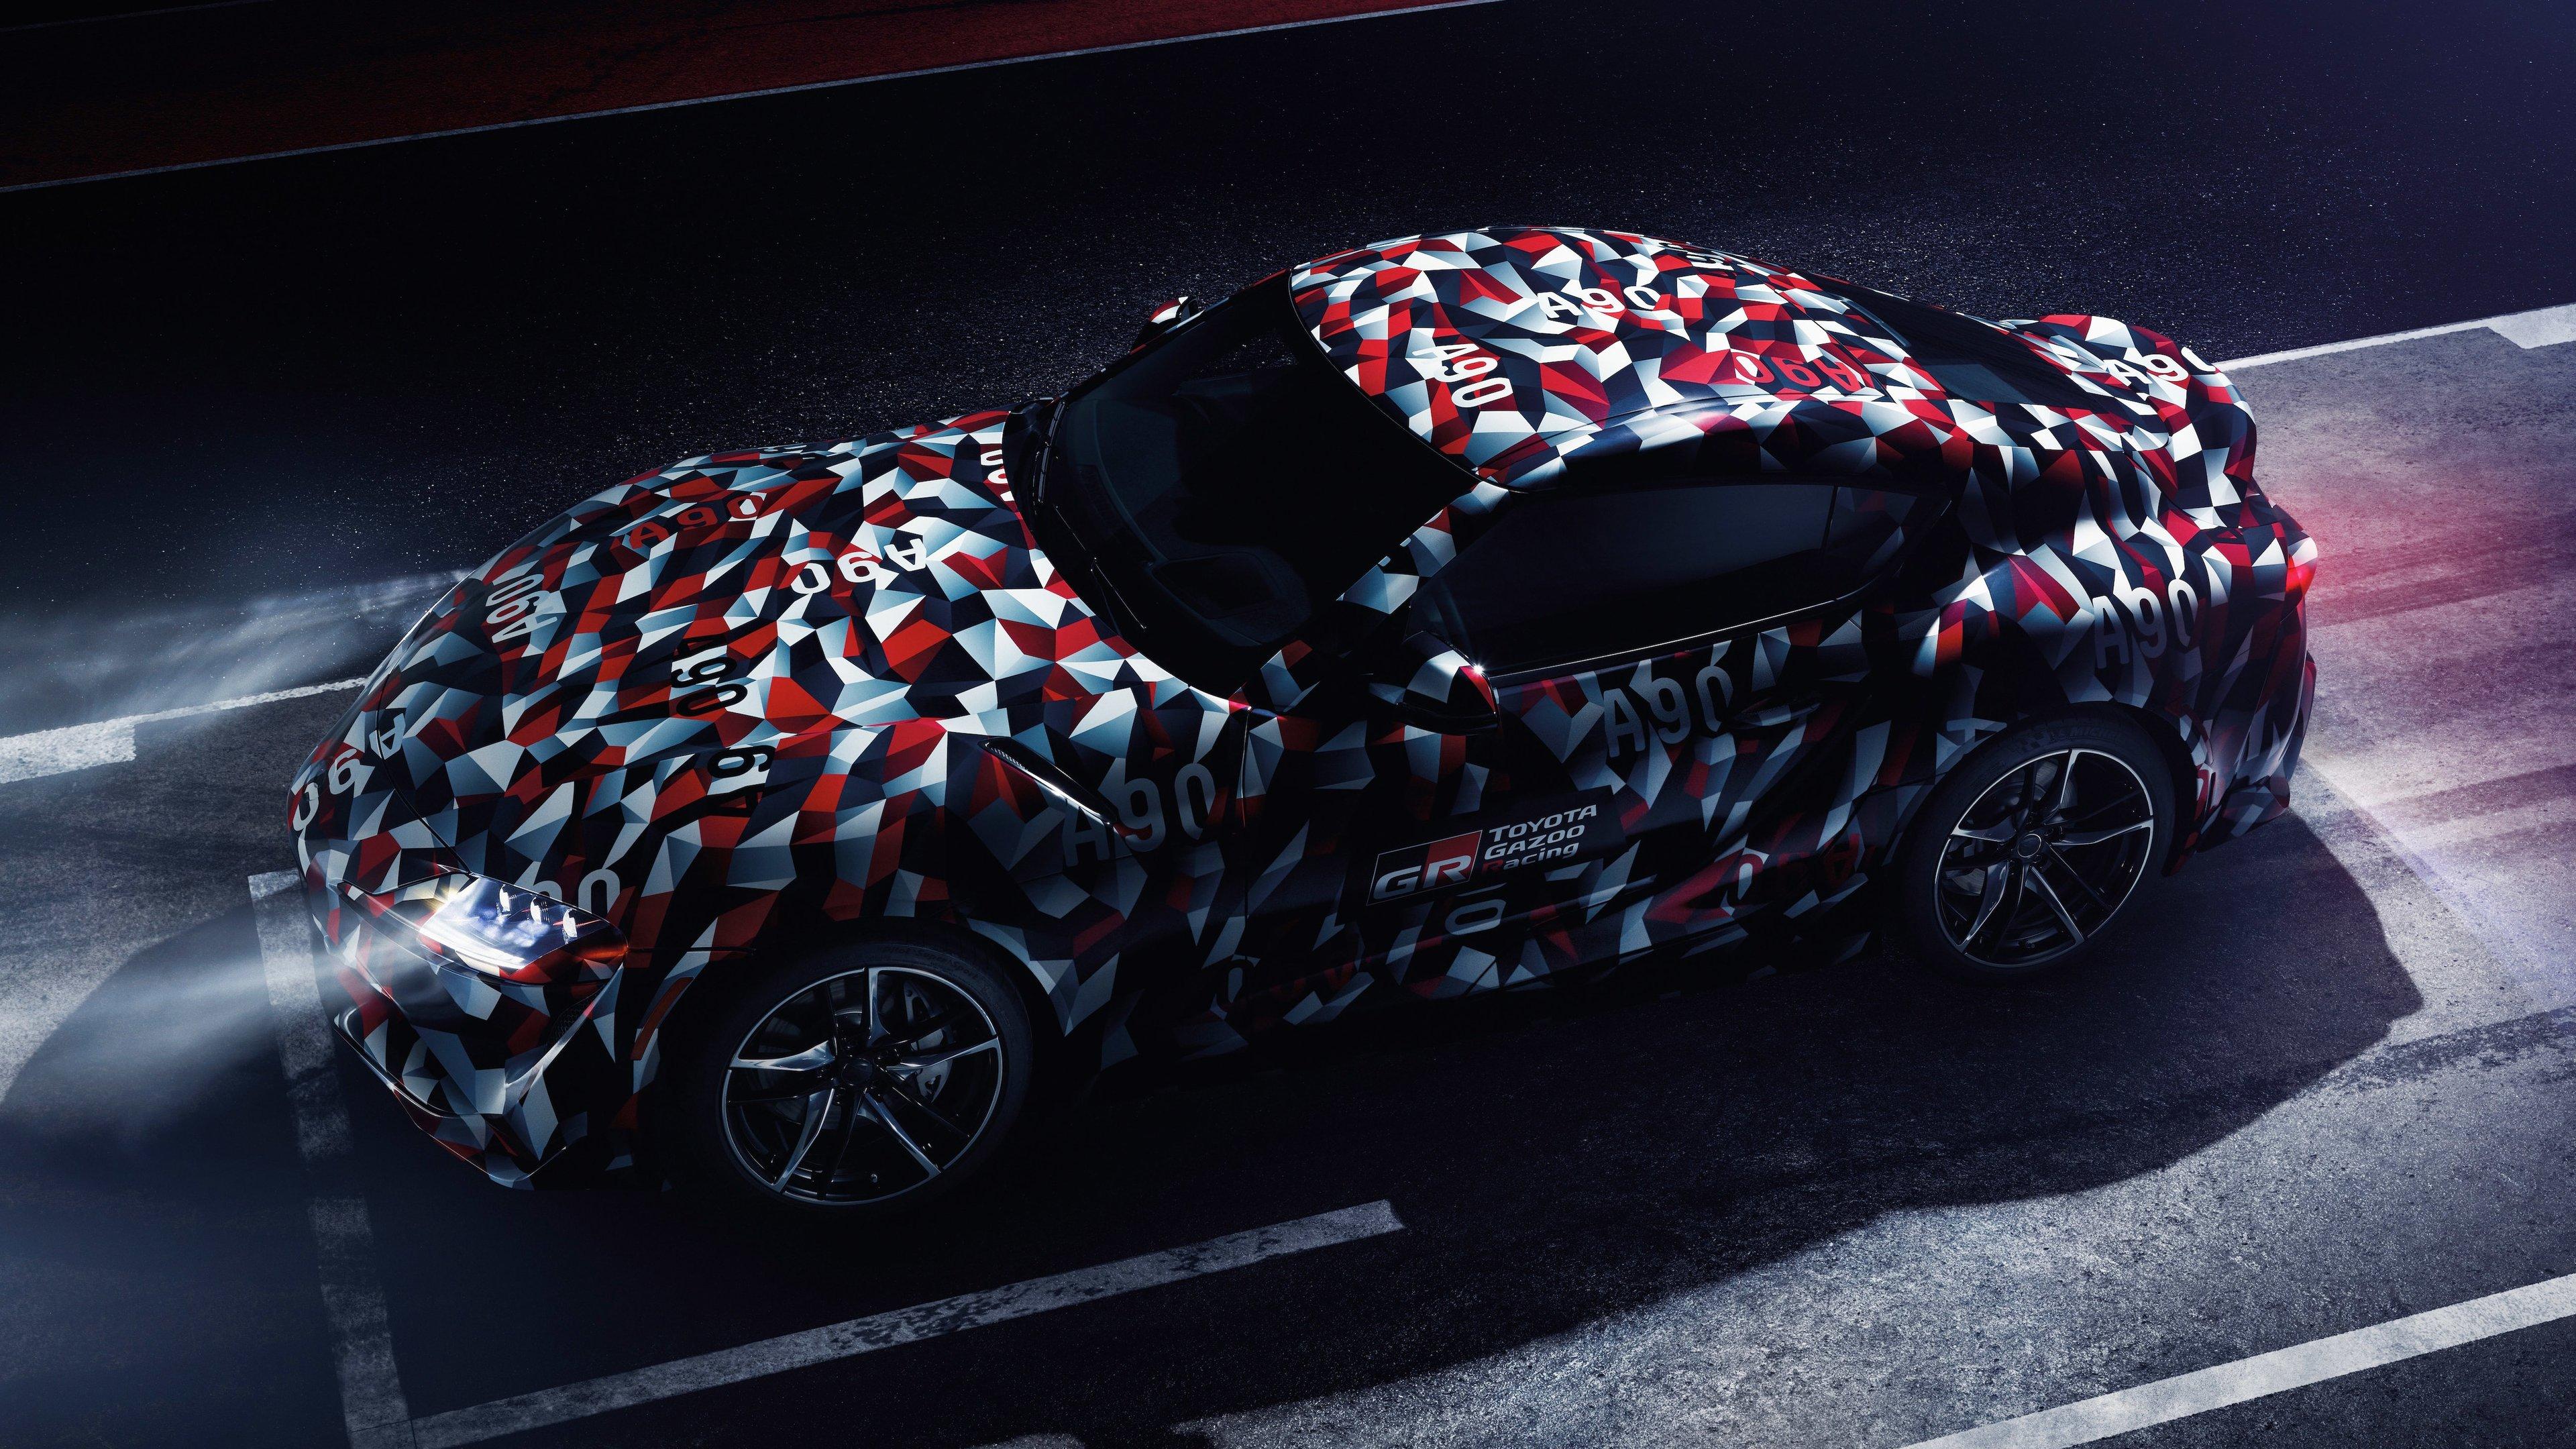 toyota supra 2018 1539112212 - Toyota Supra 2018 - toyota supra wallpapers, hd-wallpapers, cars wallpapers, 4k-wallpapers